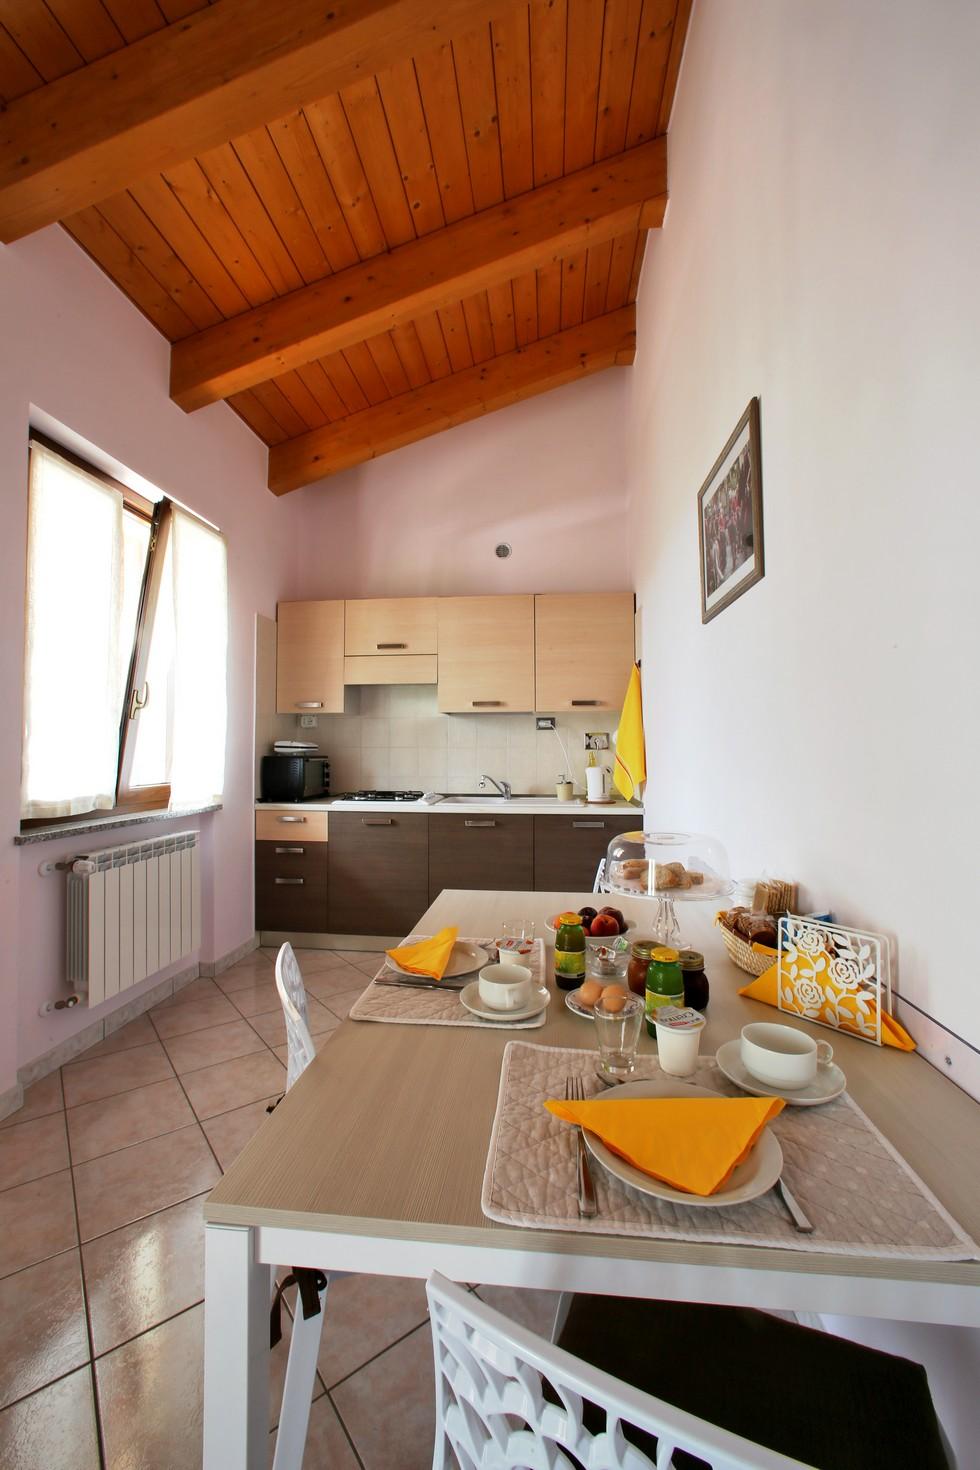 Cucina in appartamento per vacanze